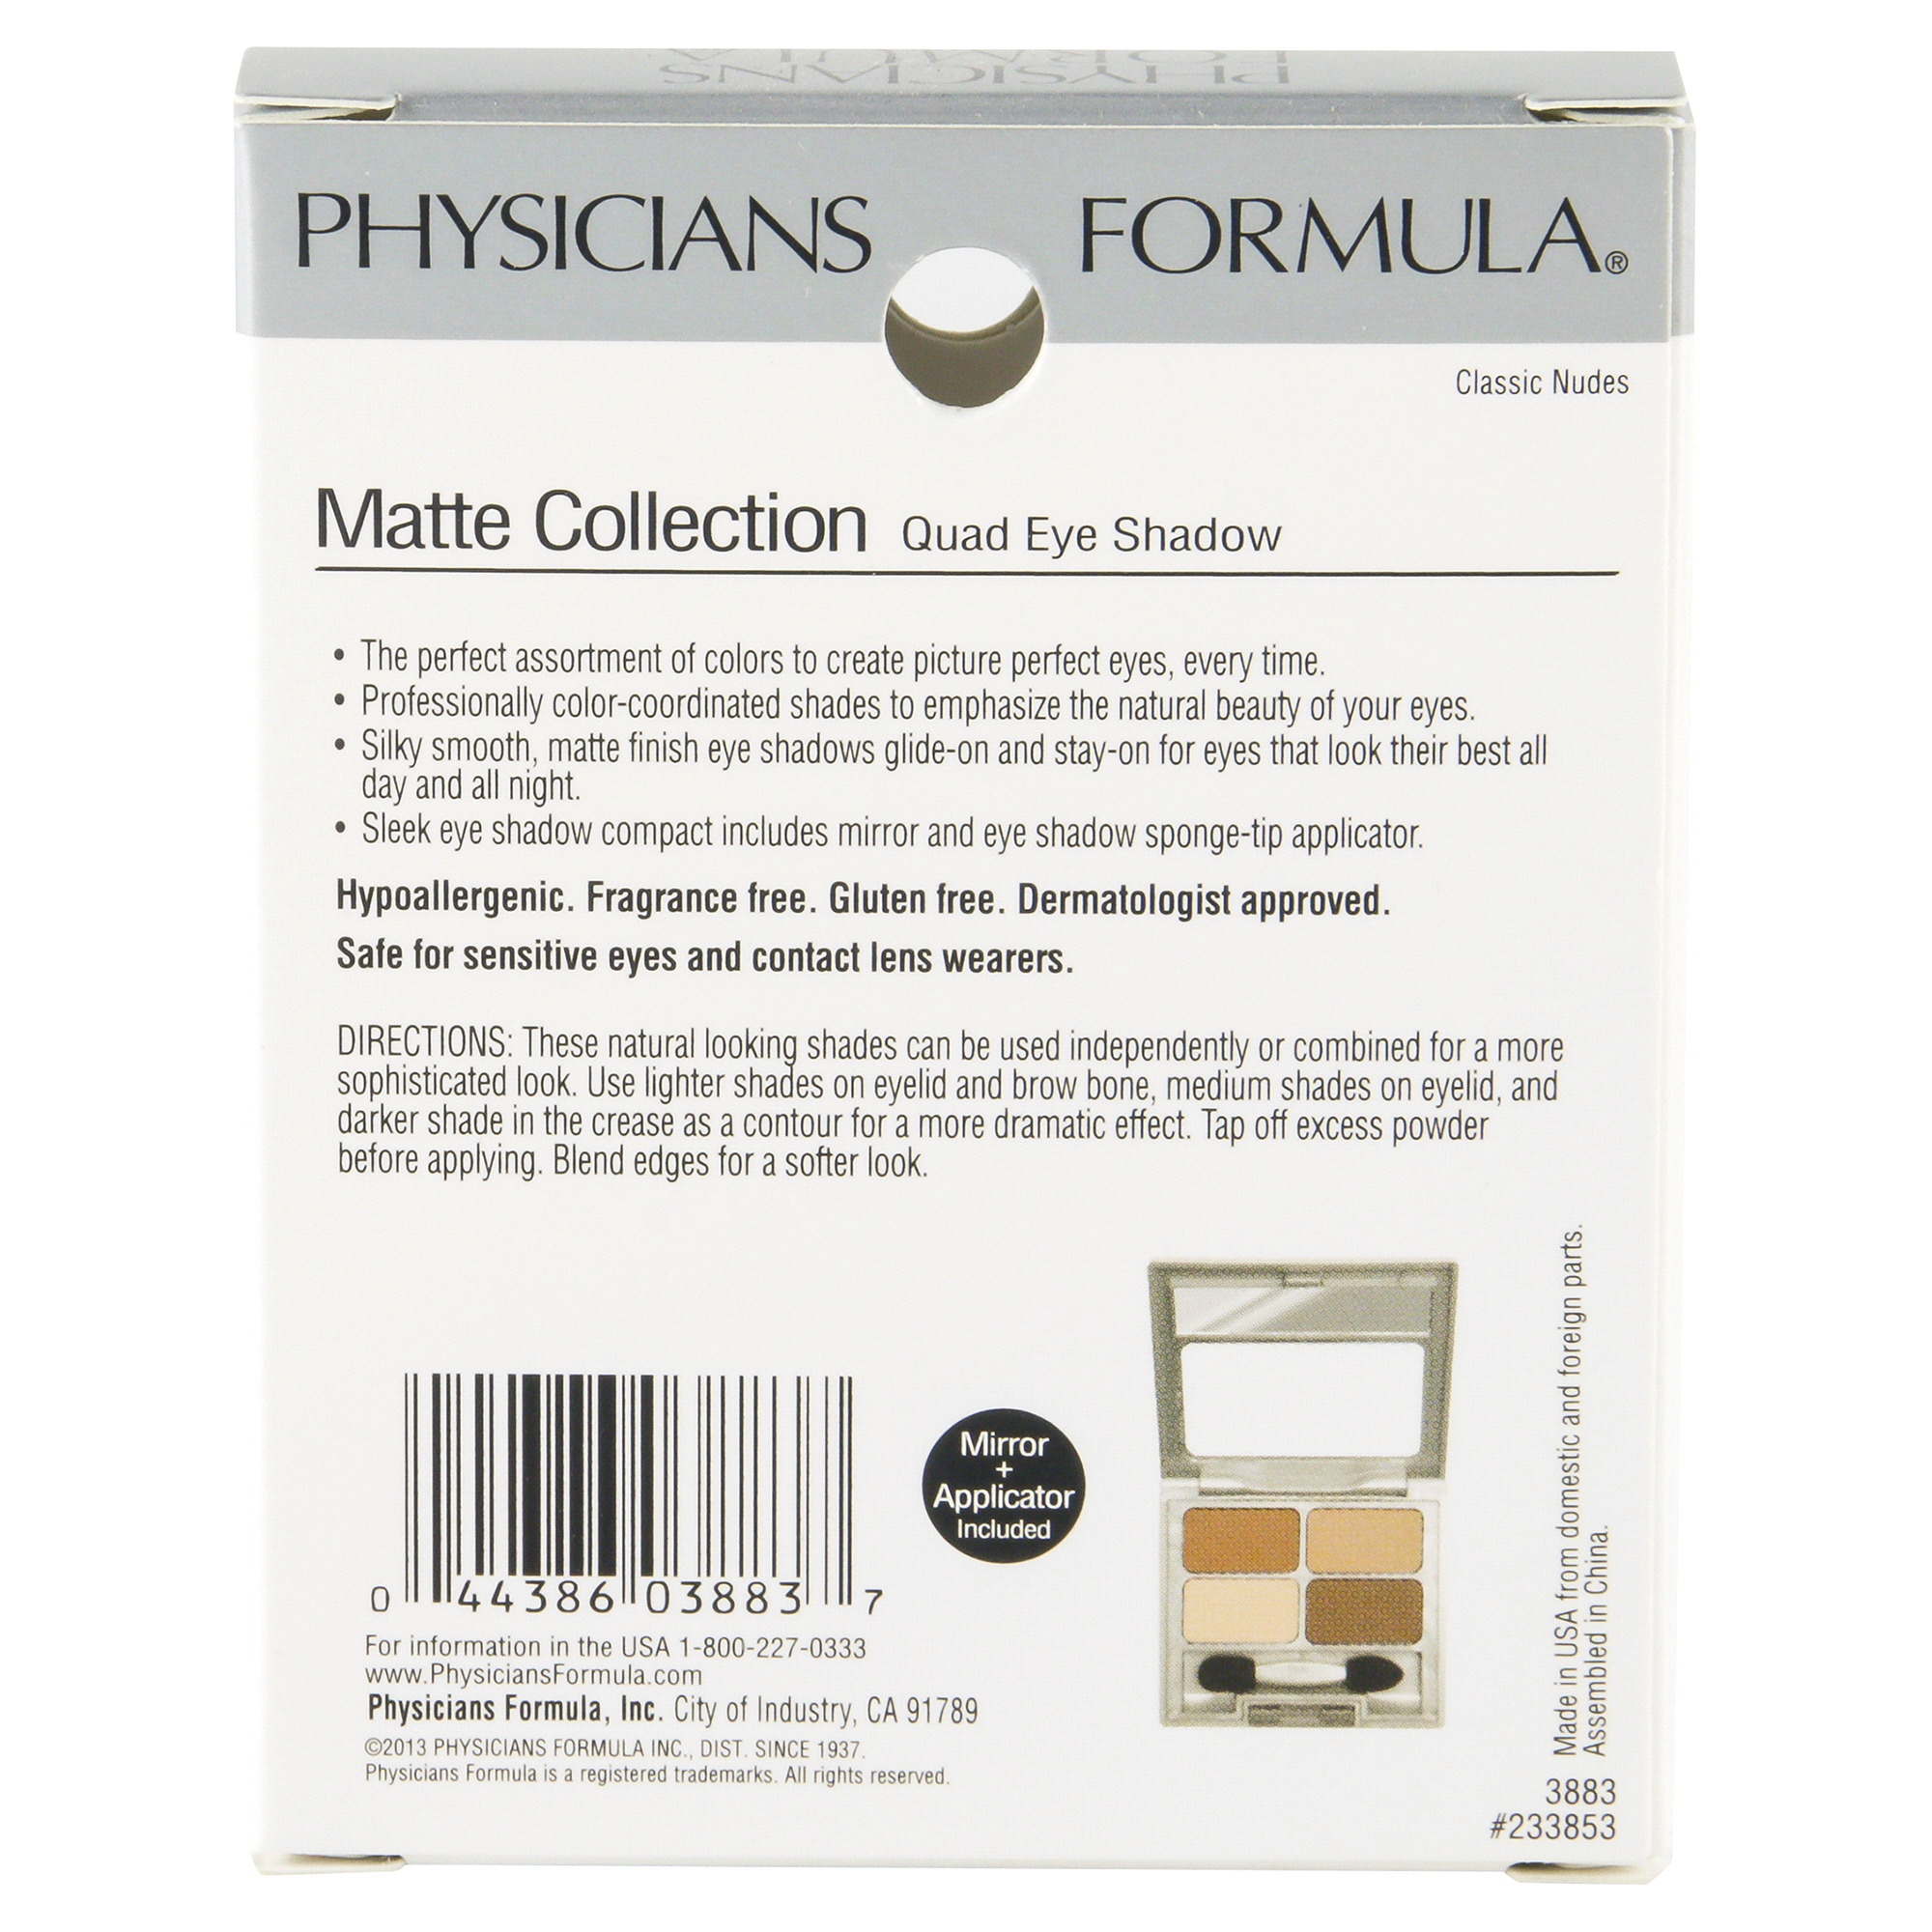 Physicians Formula Matte Collection Quad Eye Shadow Classic Nudes City Color Brow Medium 3883 22 Oz